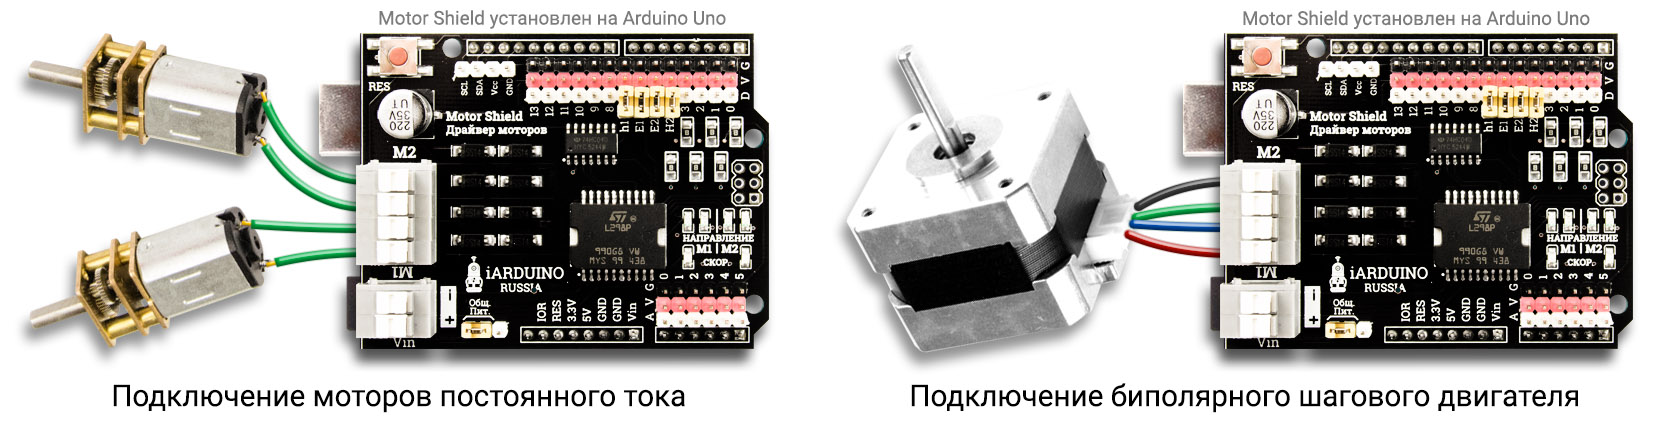 Схема подключения моторов к MotorShield на базе чипа L298